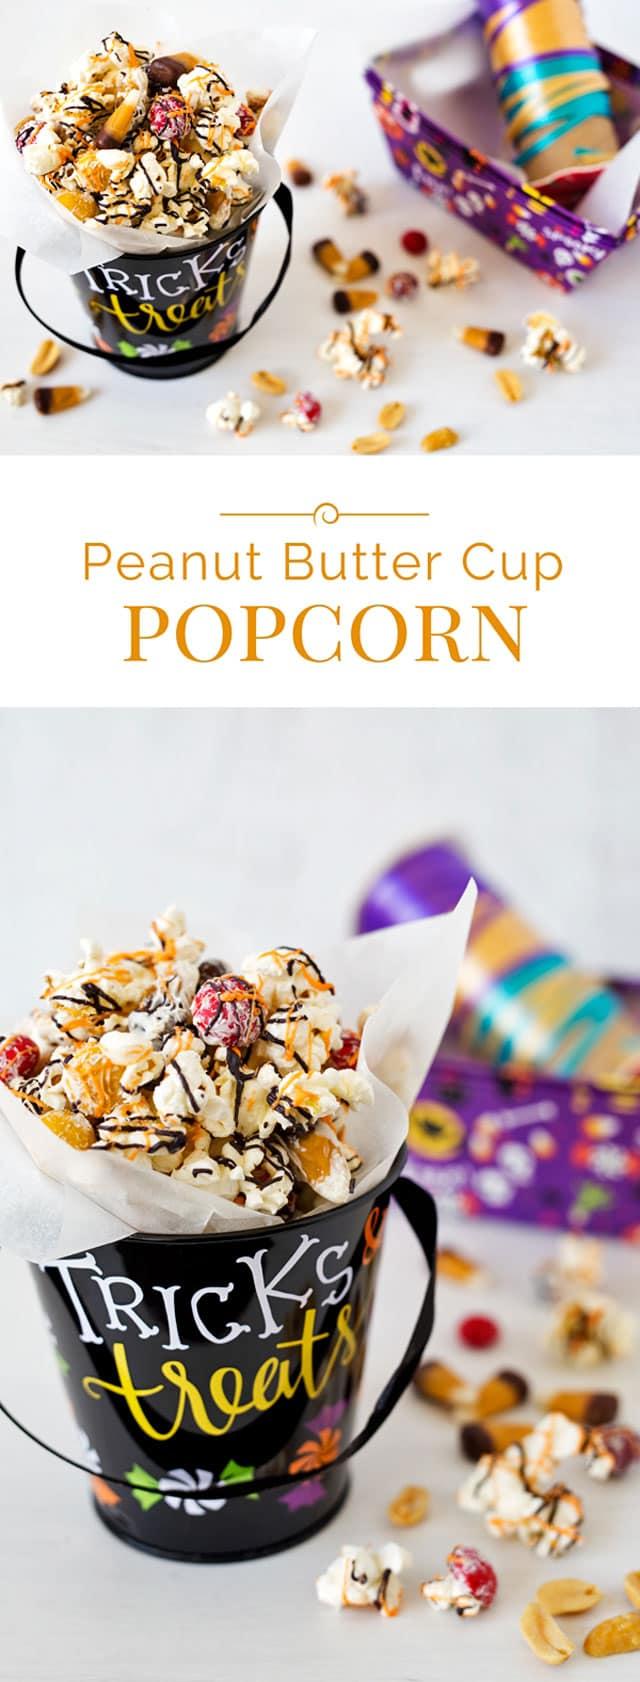 Halloween-Chocolate-Peanut-Butter-Popcorn-Collage-2-Barbara-Bakes